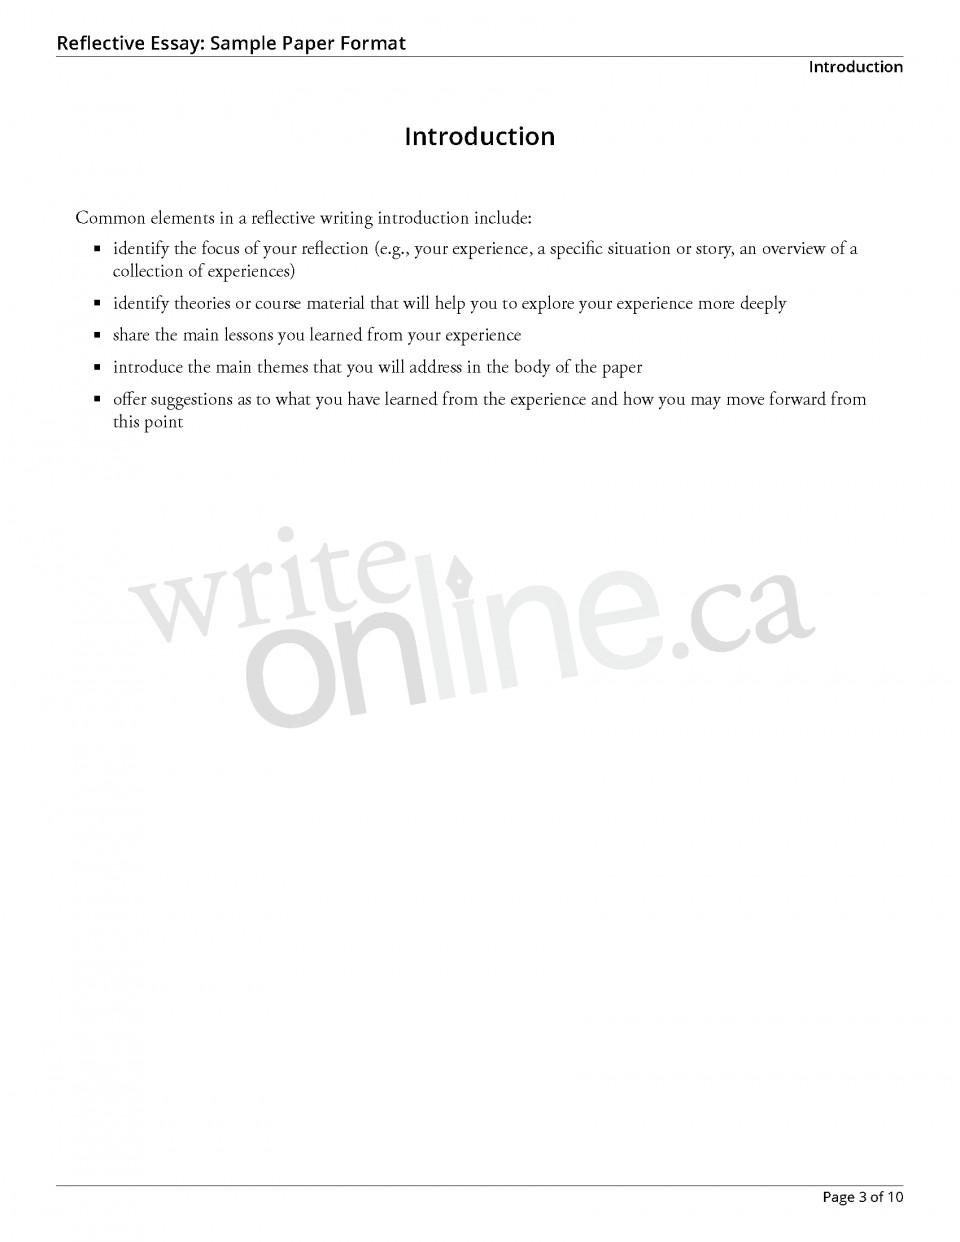 Resume writing services lincoln ne how i write cv